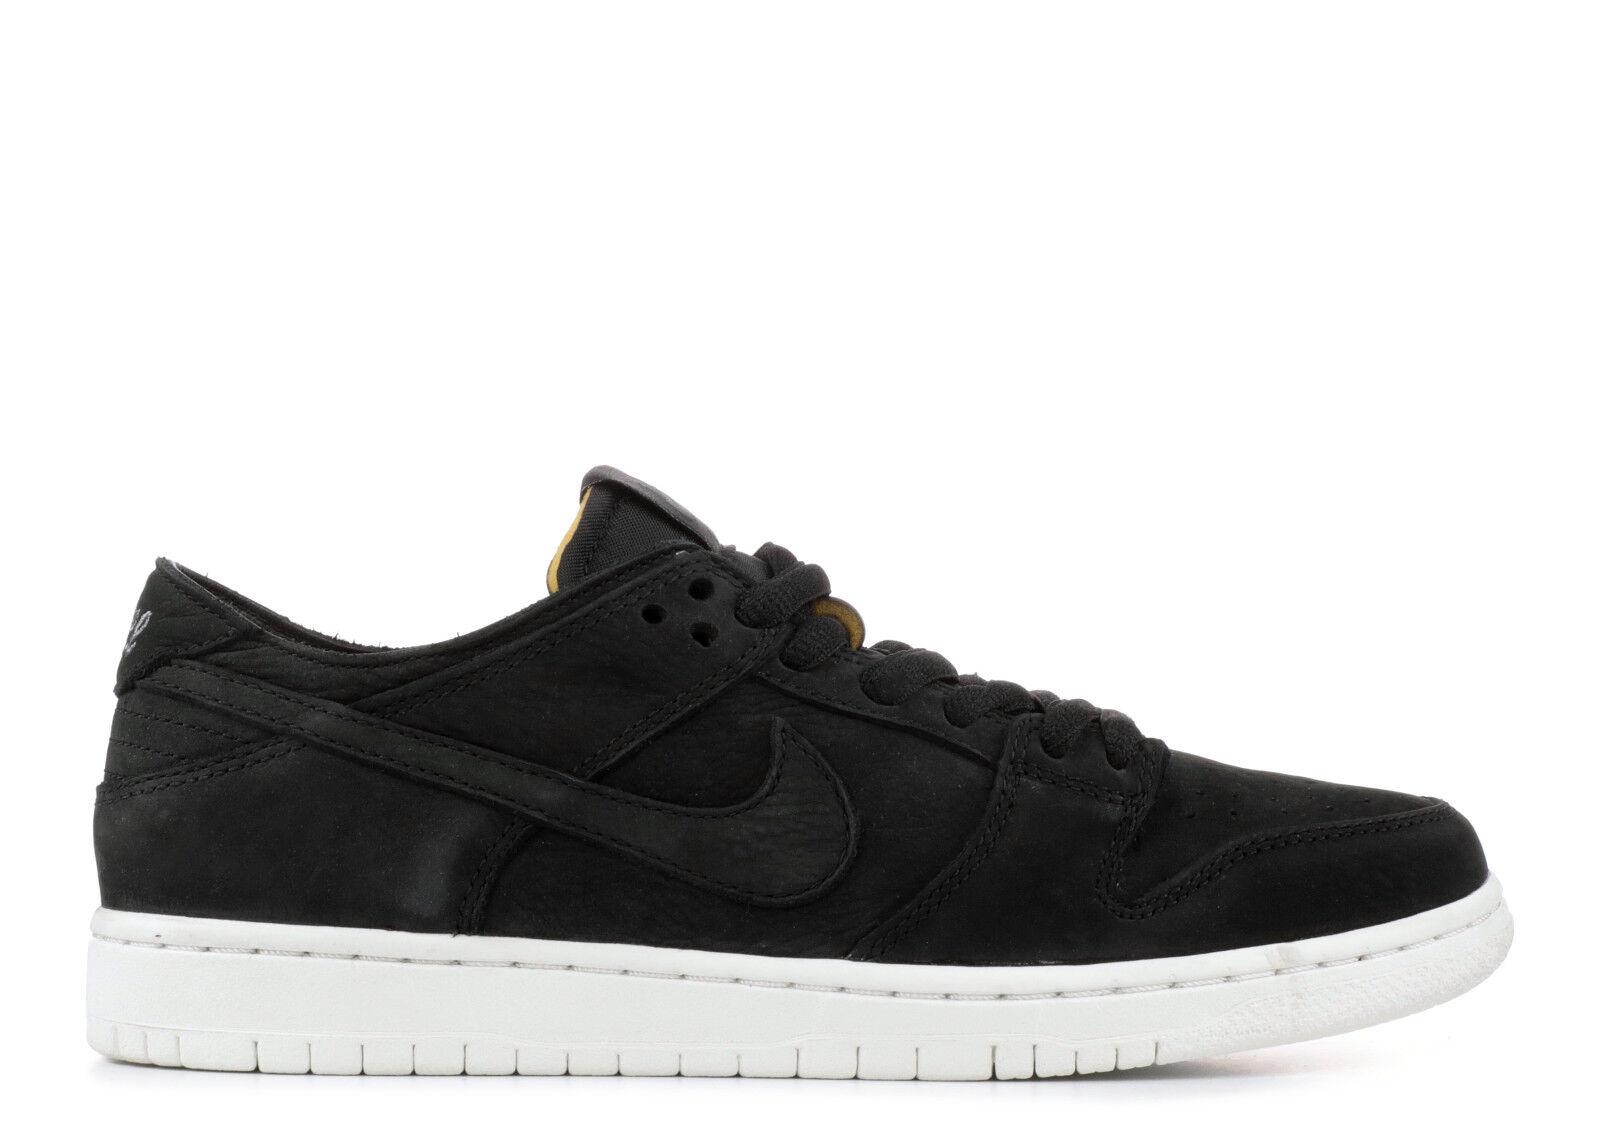 Nike Dunk SB Zoom Low Pro BLACK WHITE GUM BOTTOM SOLE HIGH OG 854866-019 sz 7